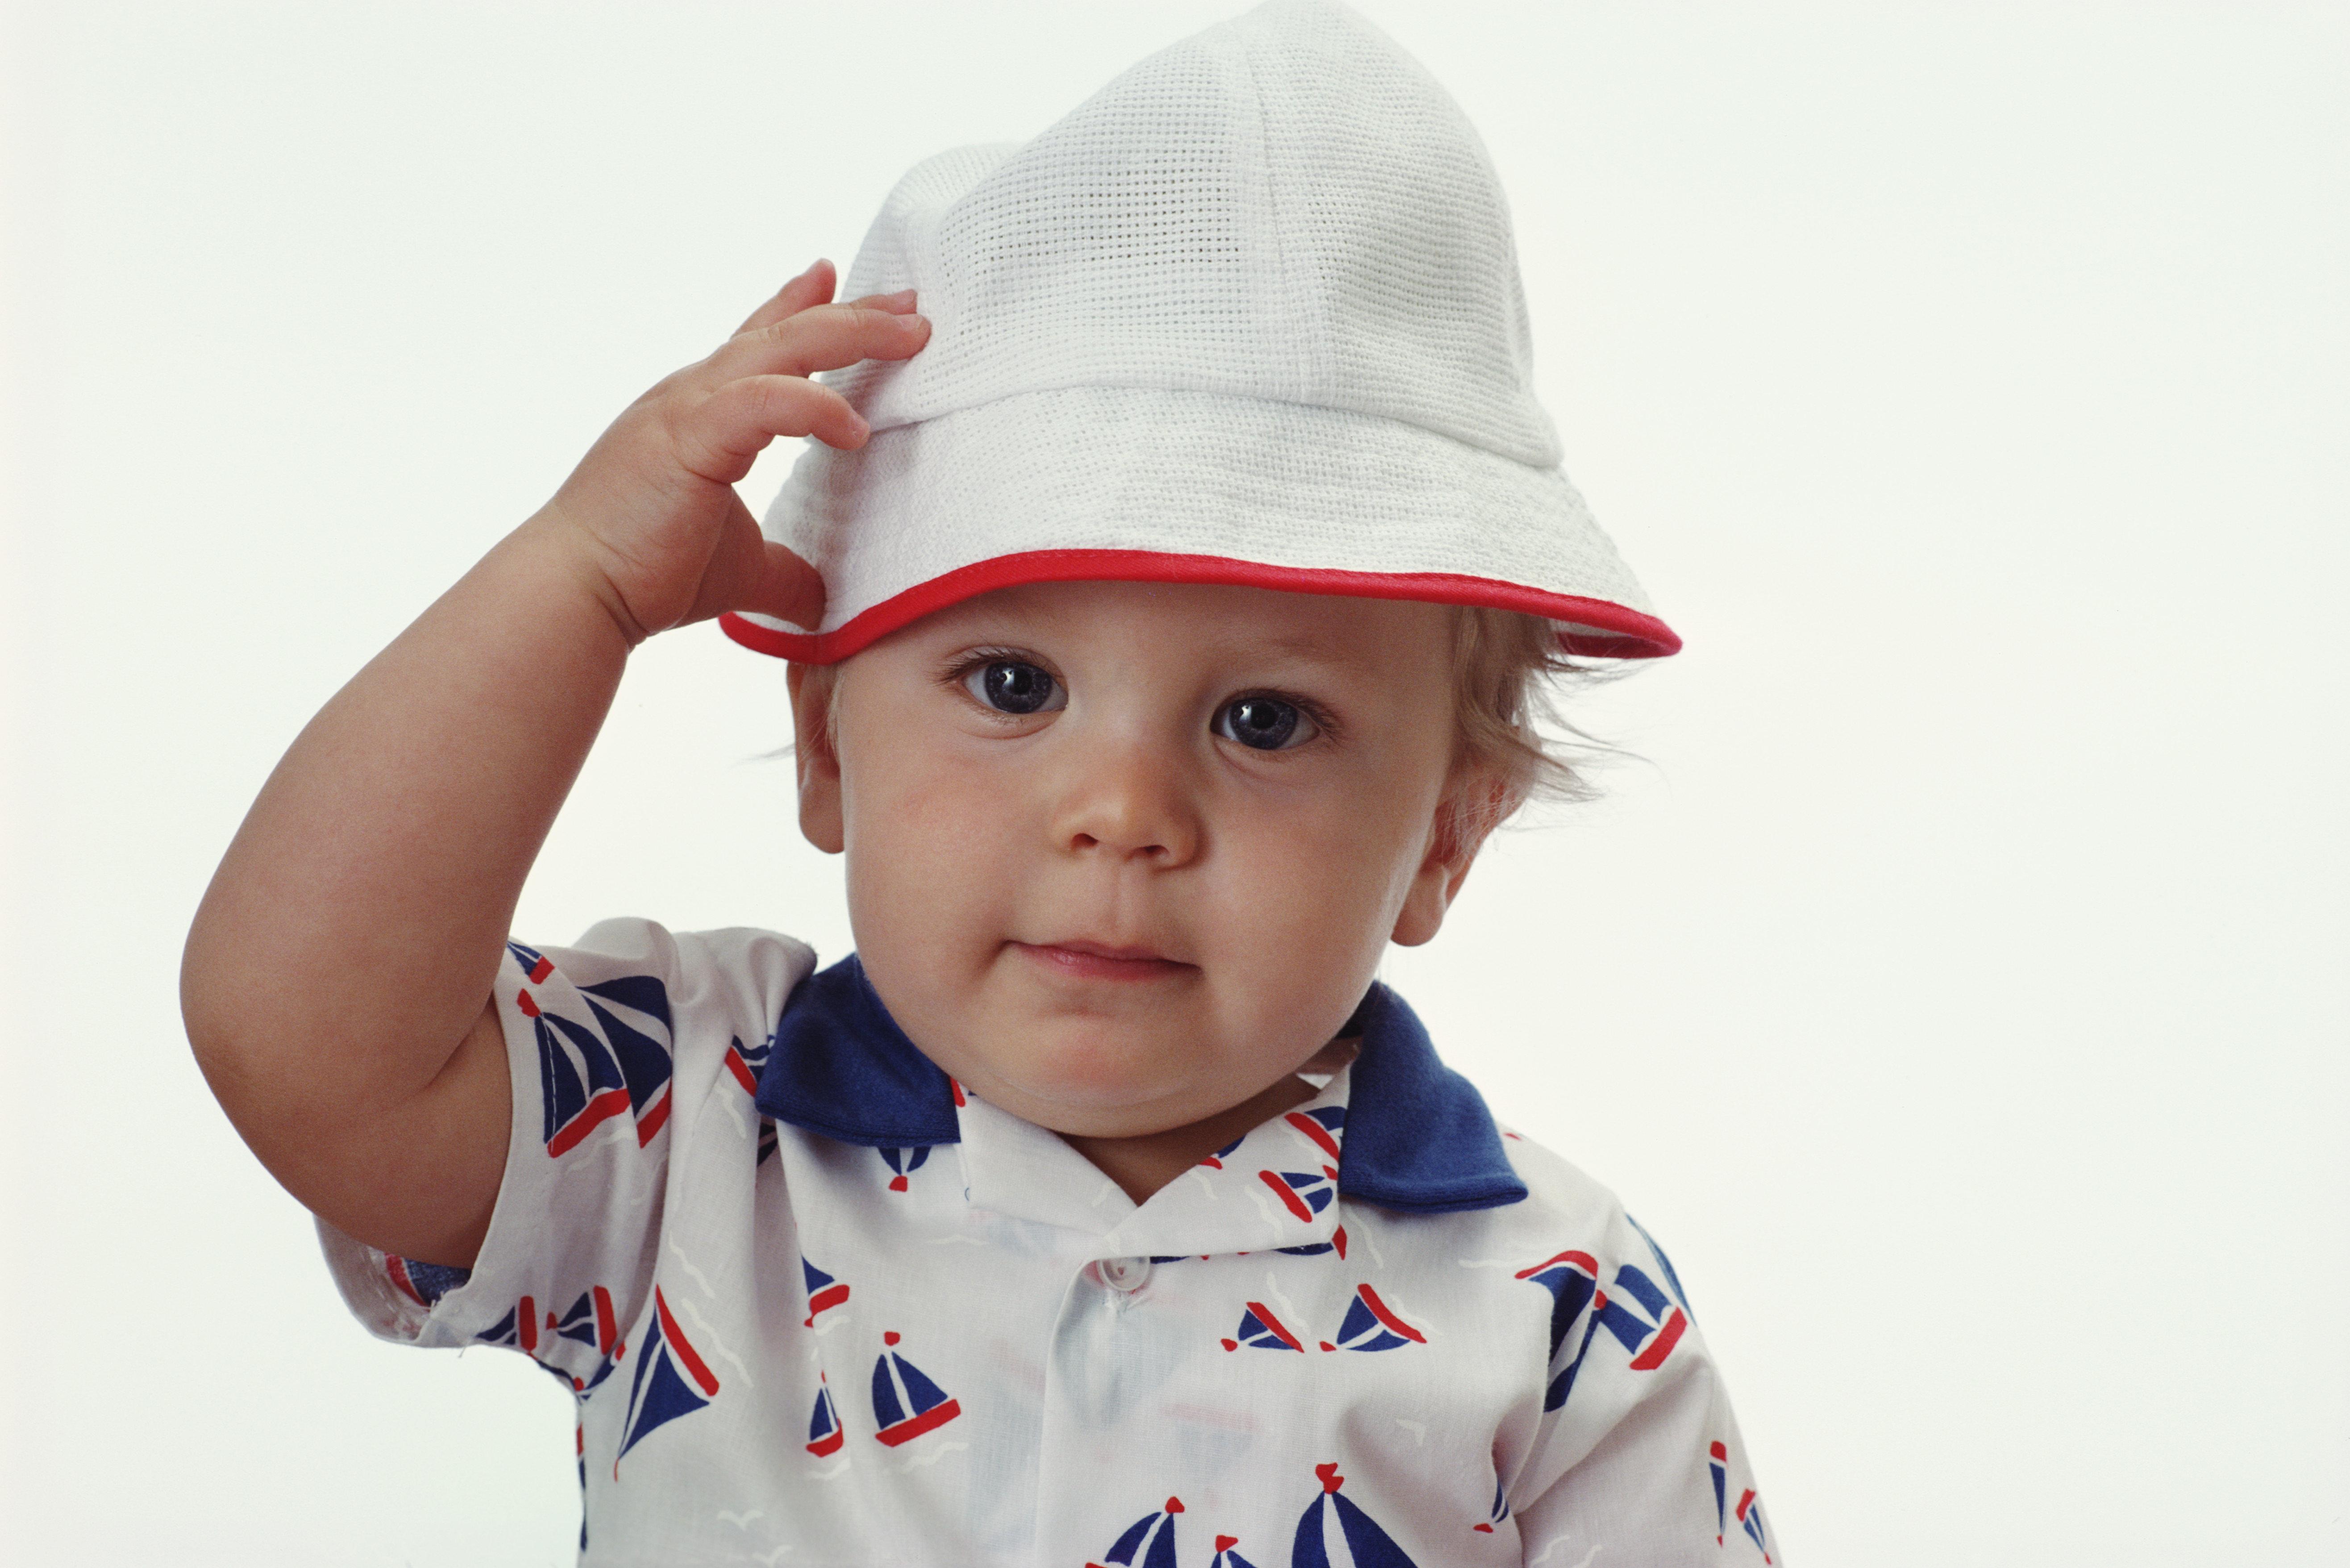 Baby boy (9-12 months) wearing hat, close-up, portrait